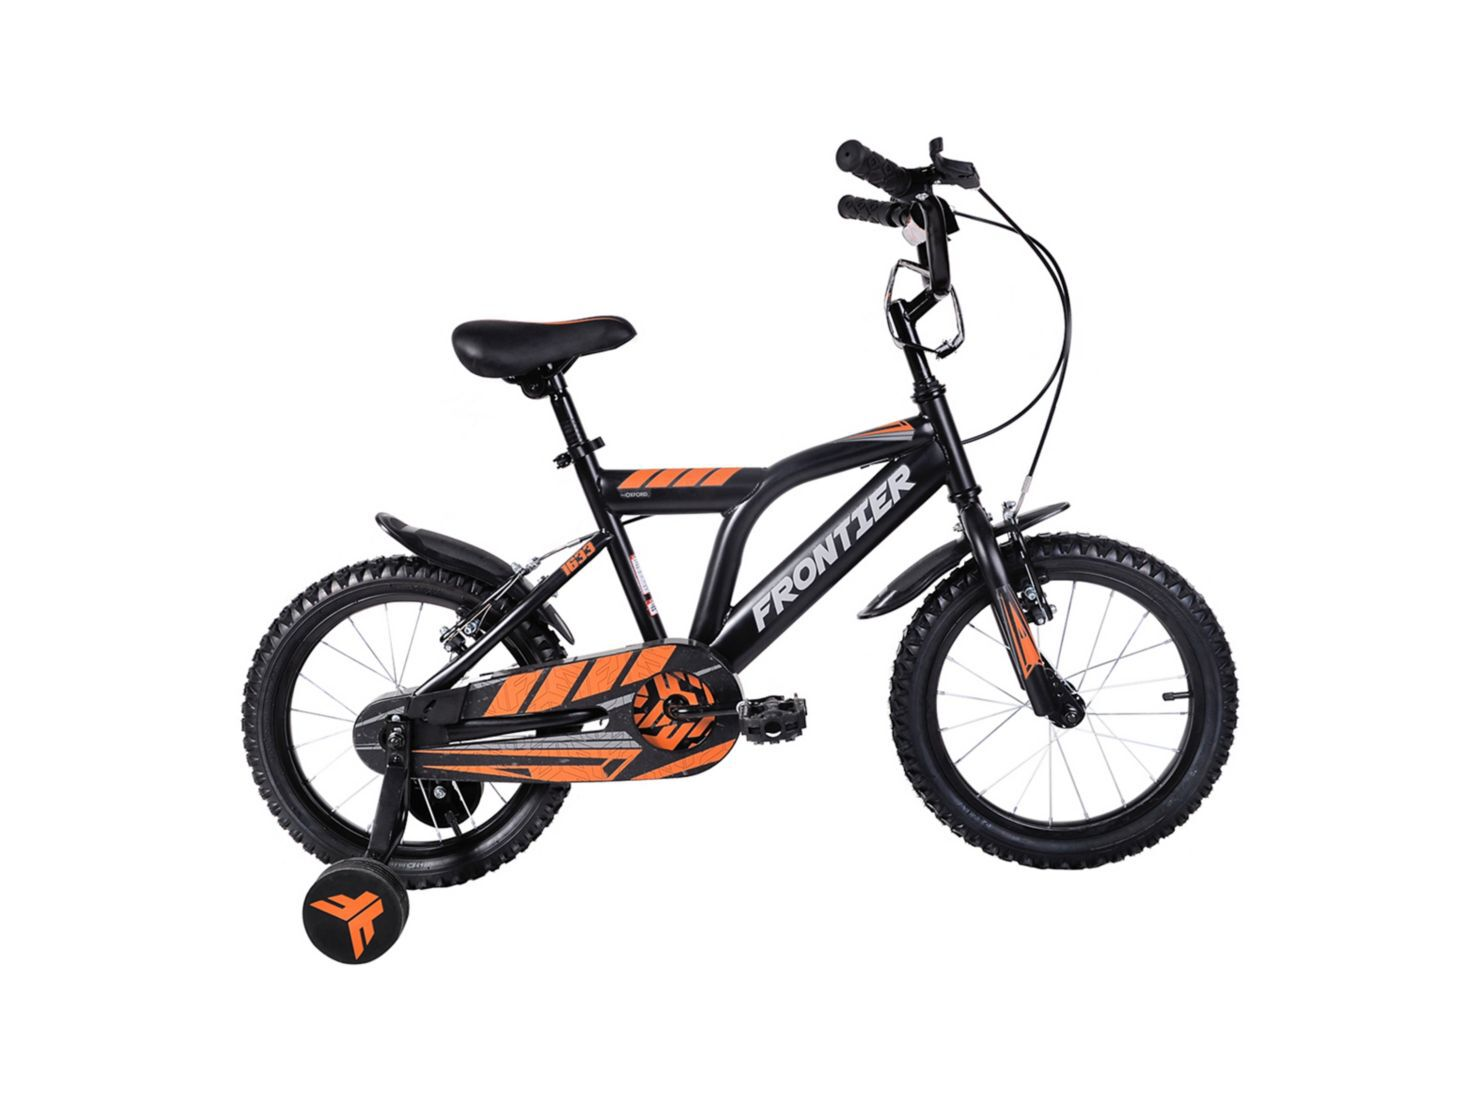 Negro Bicicleta Oxford Bm1633 Infantil Frontier dBxoEQrCeW